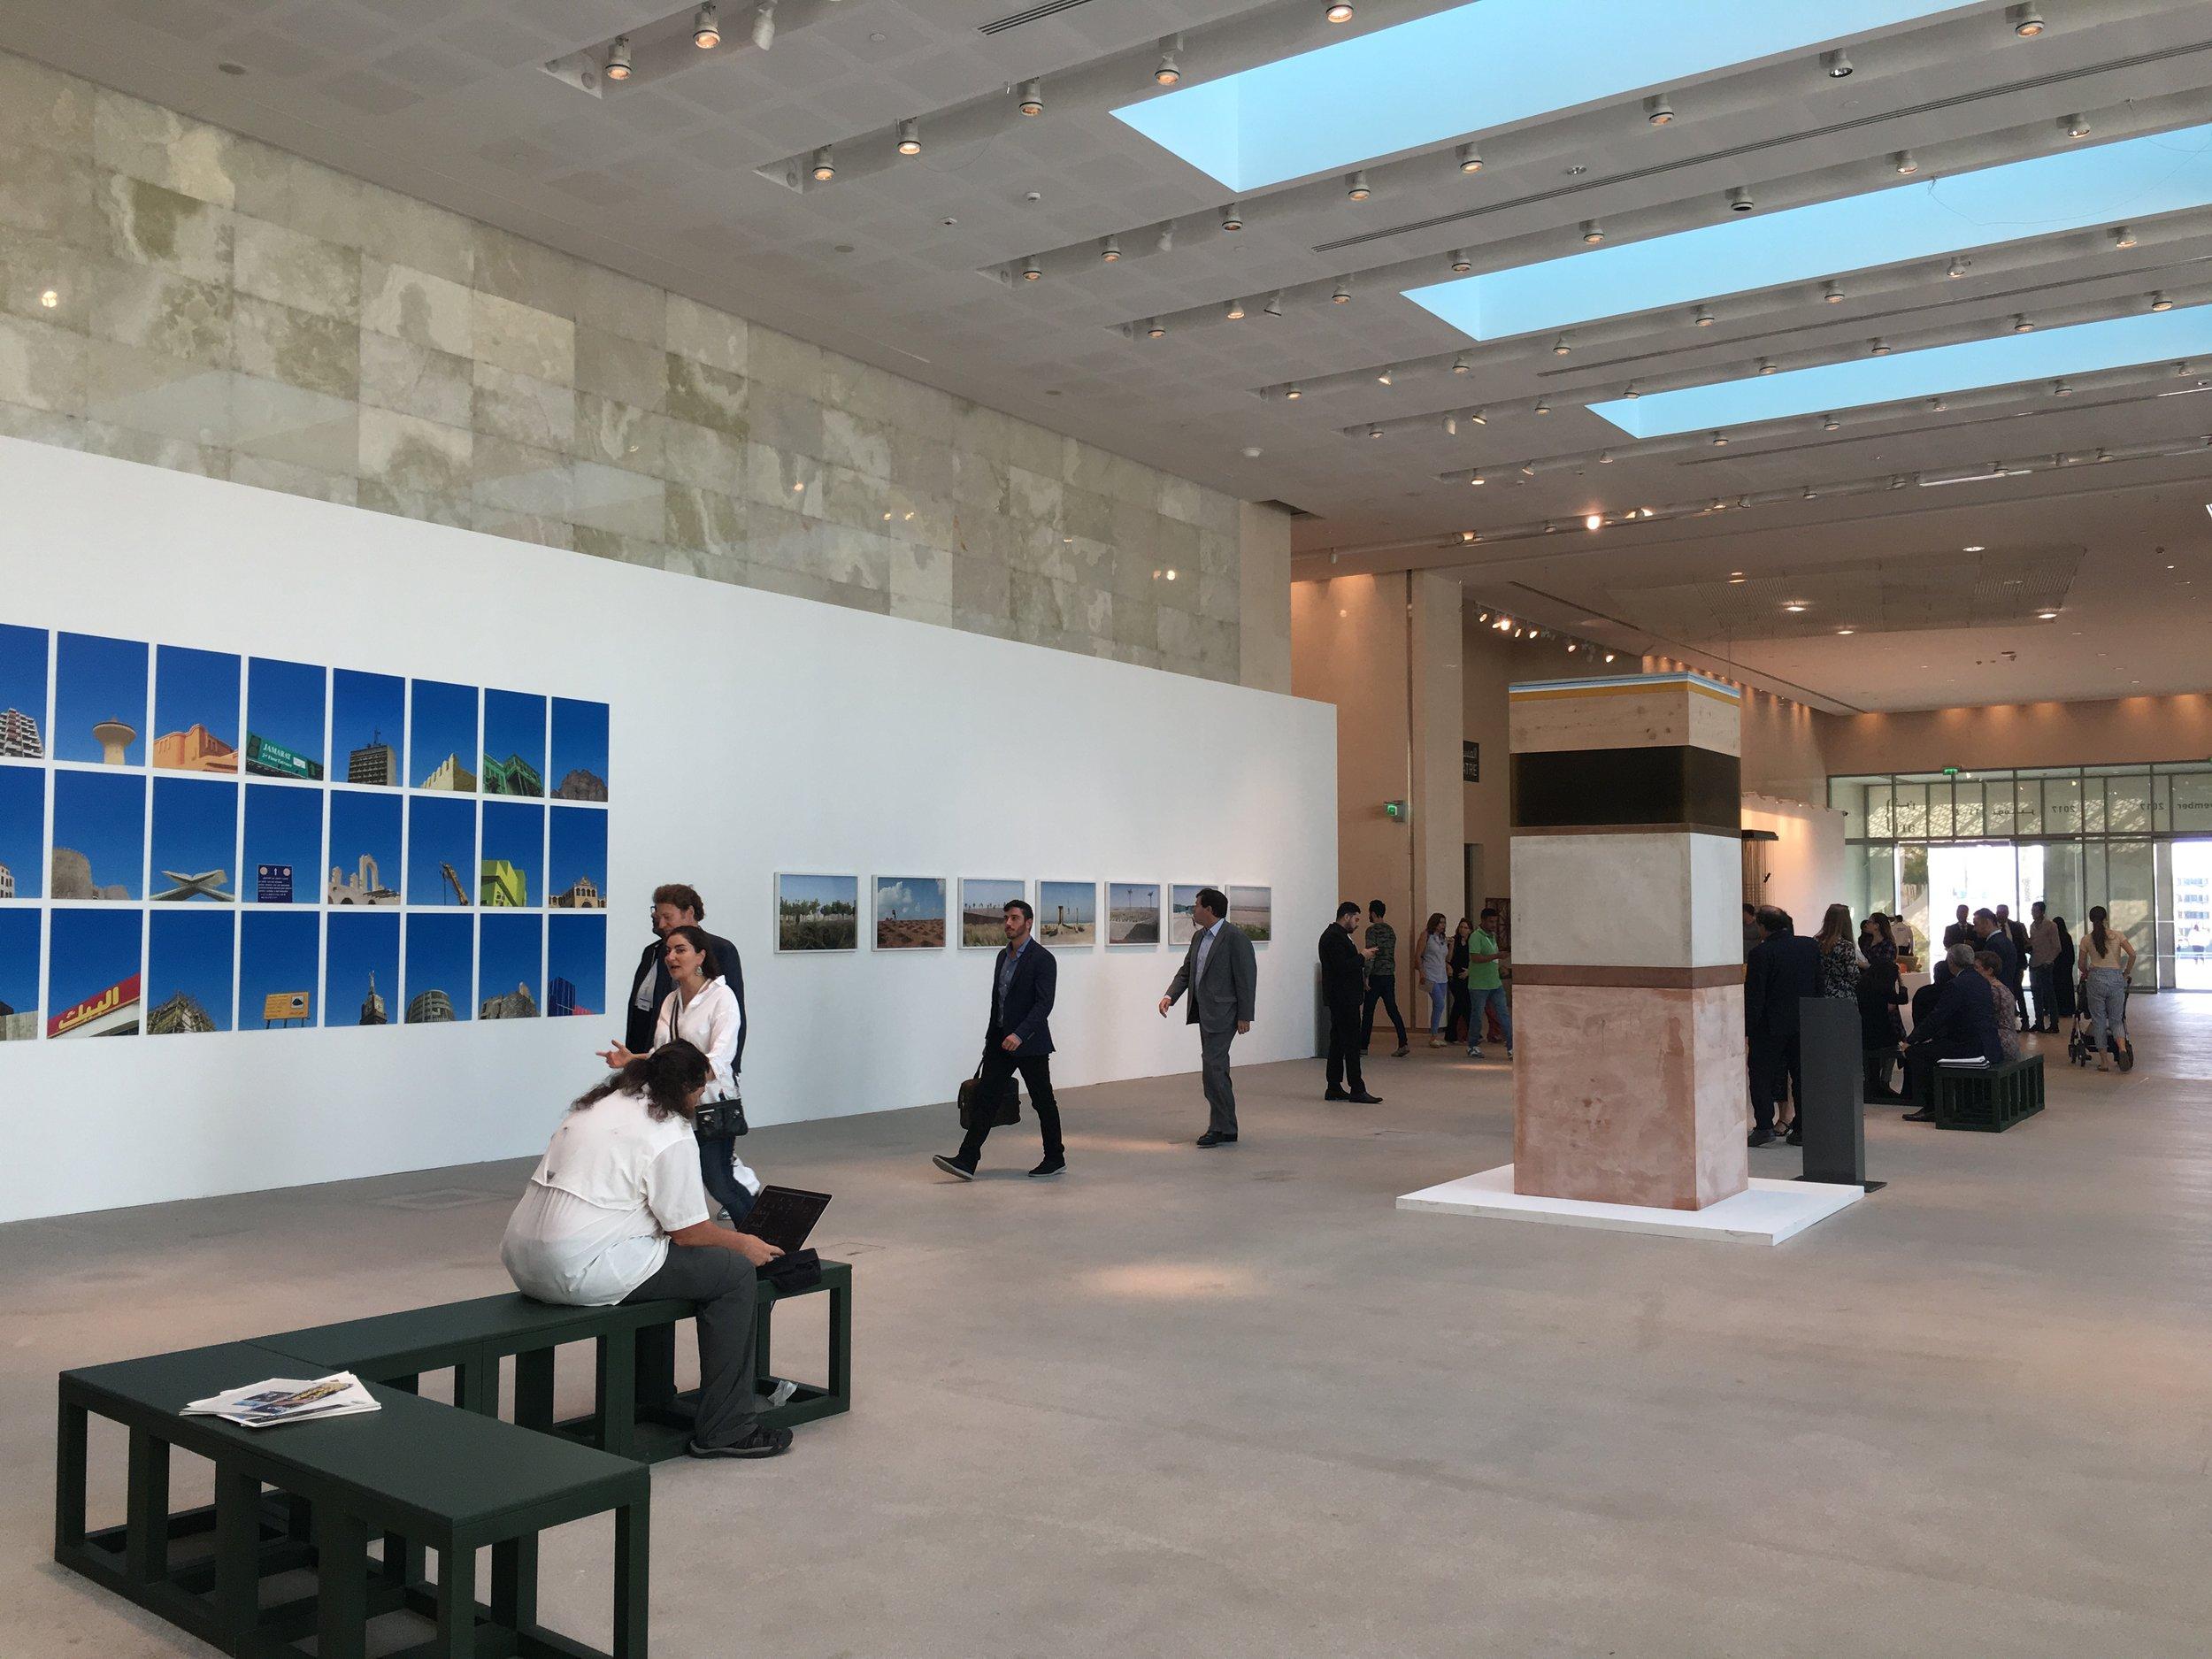 The entrance to Abu Dhabi Art, 2017. Image taken by Anna Seaman